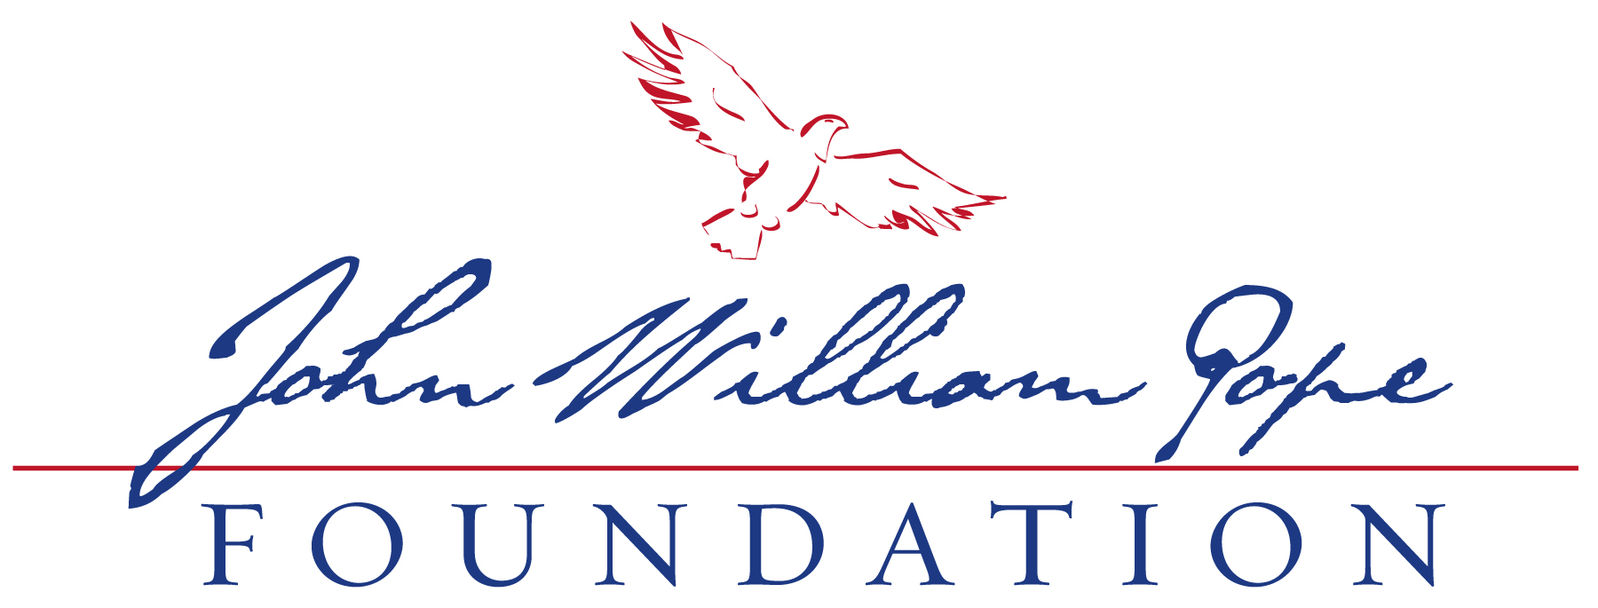 John W. Pope Foundation logo